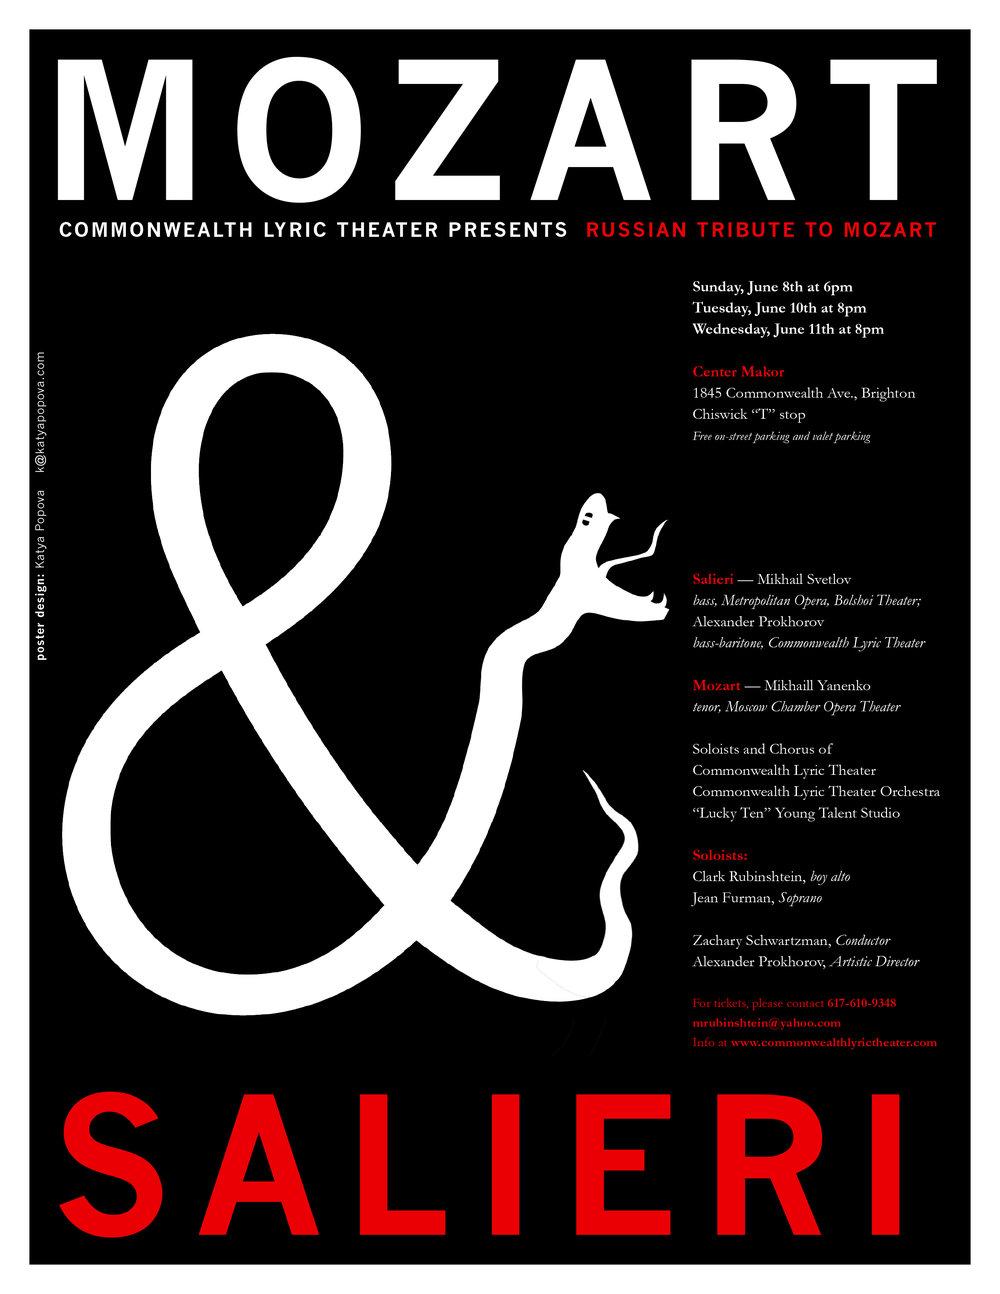 Mozart&Salieri_2014.jpg